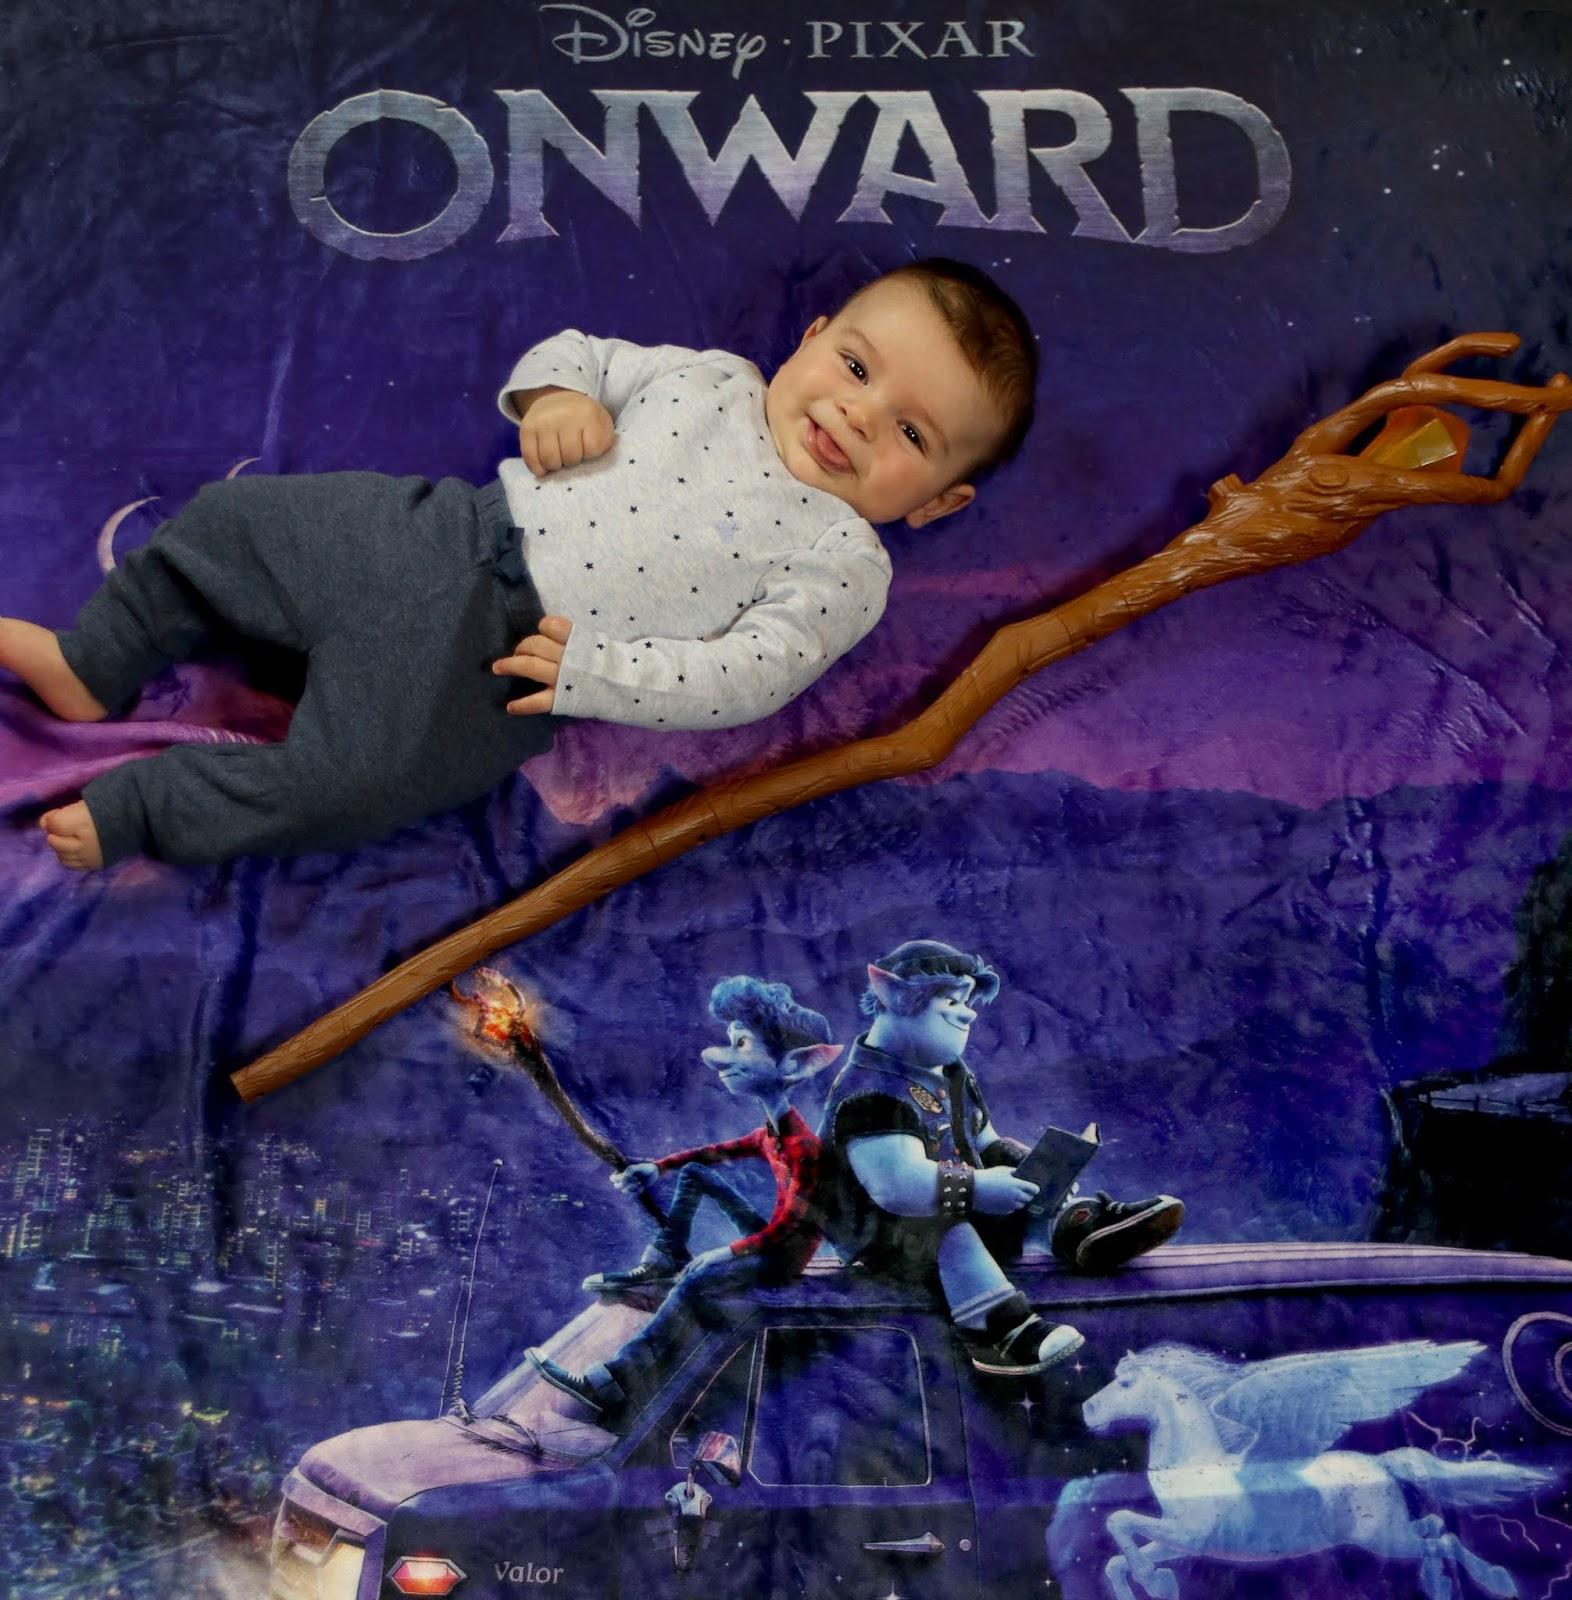 disney pixar onward leap day 2020 blanket